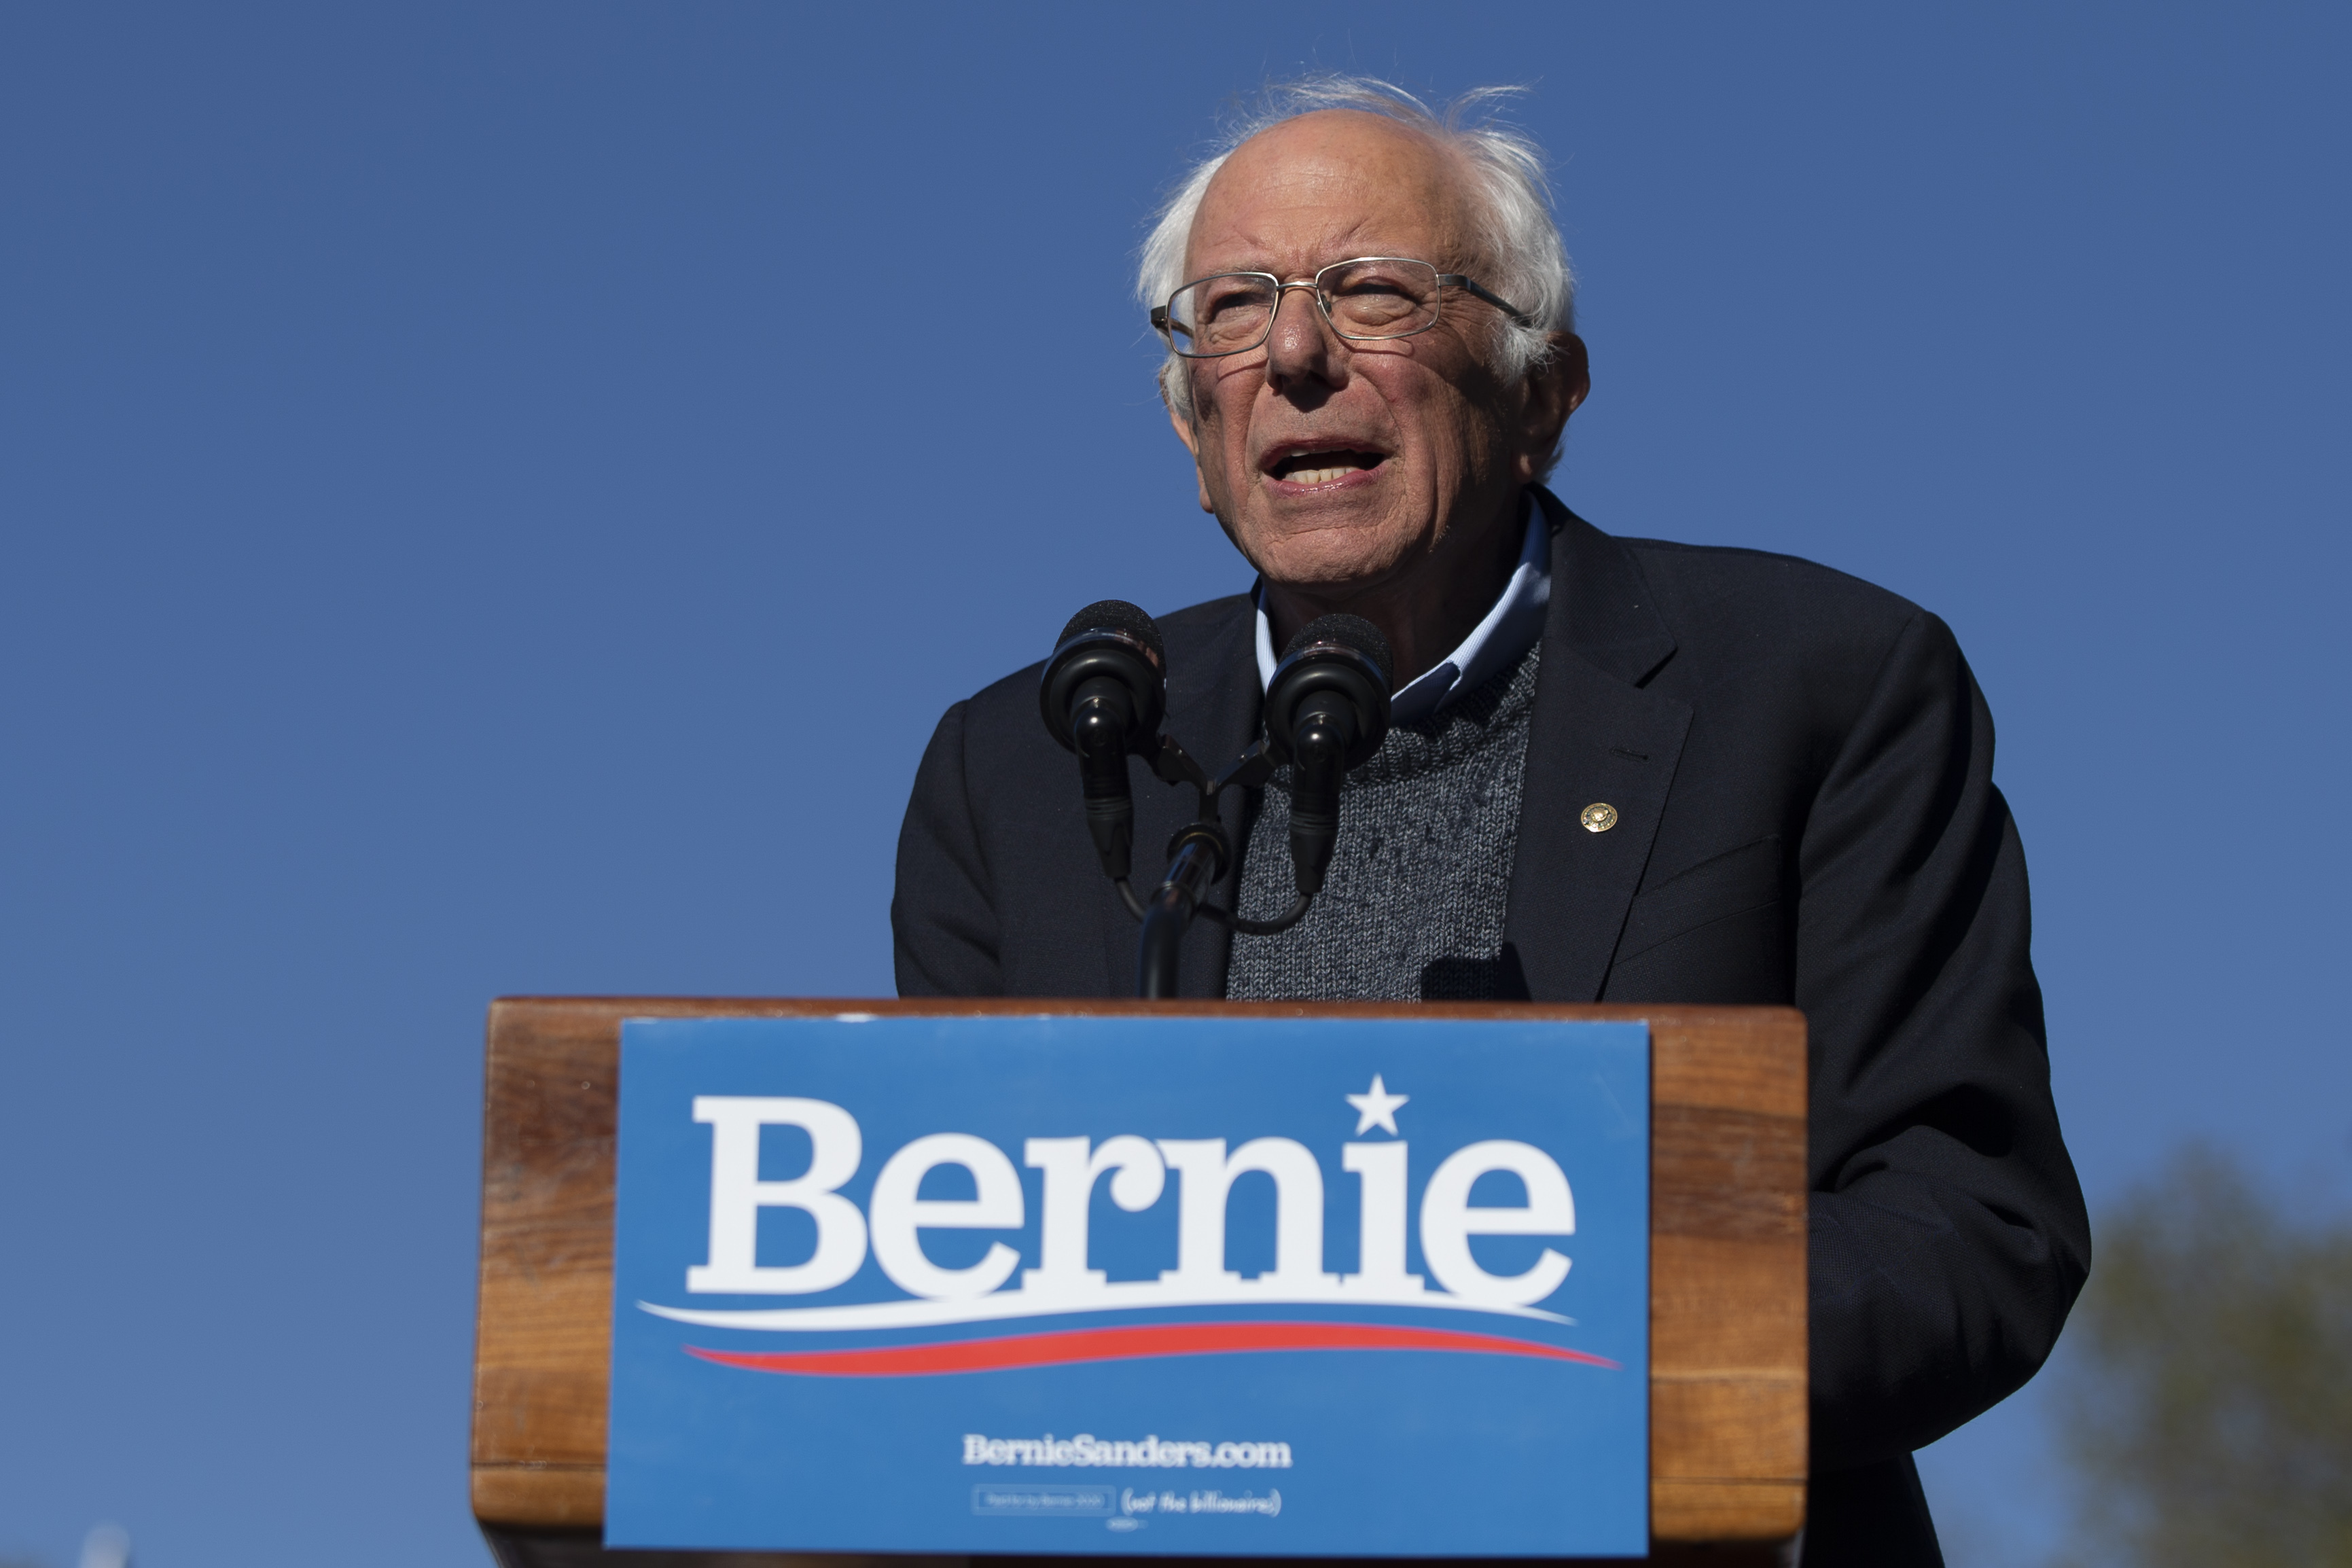 Just too darn old: Sanders, Biden confront age concerns